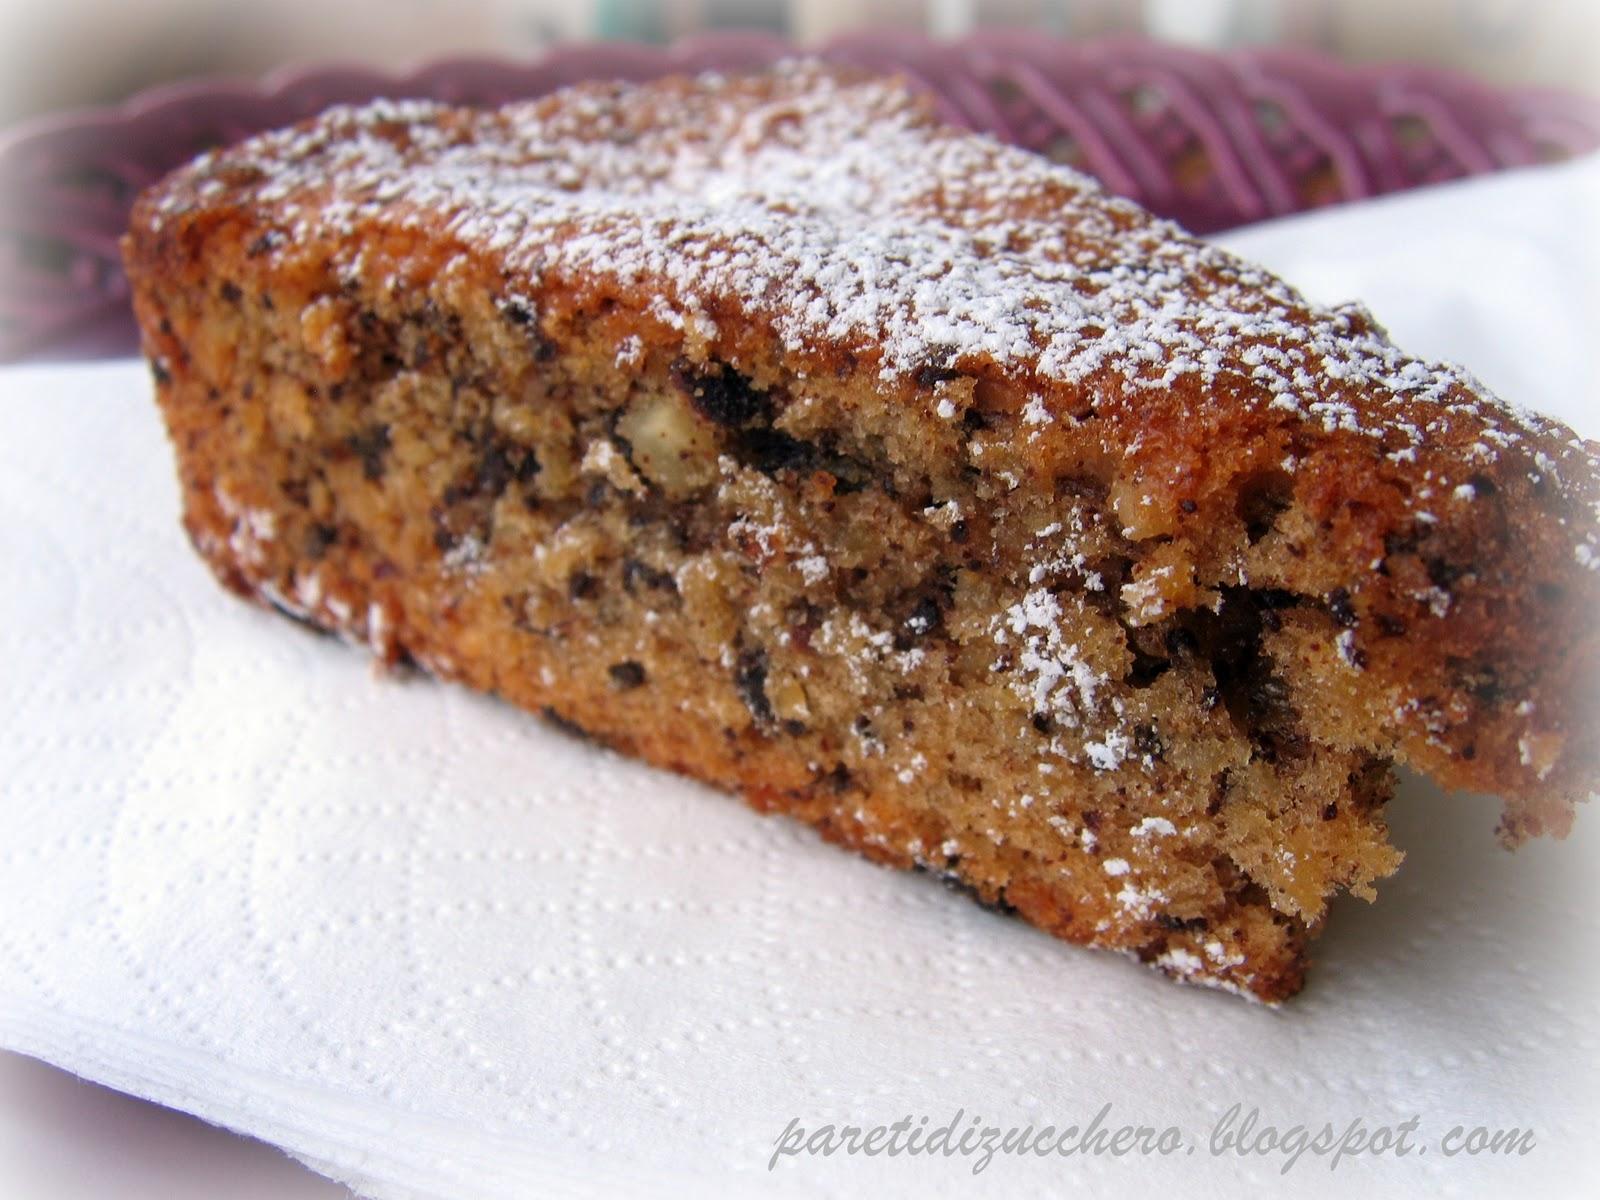 Ricette dolci con miele e mandorle